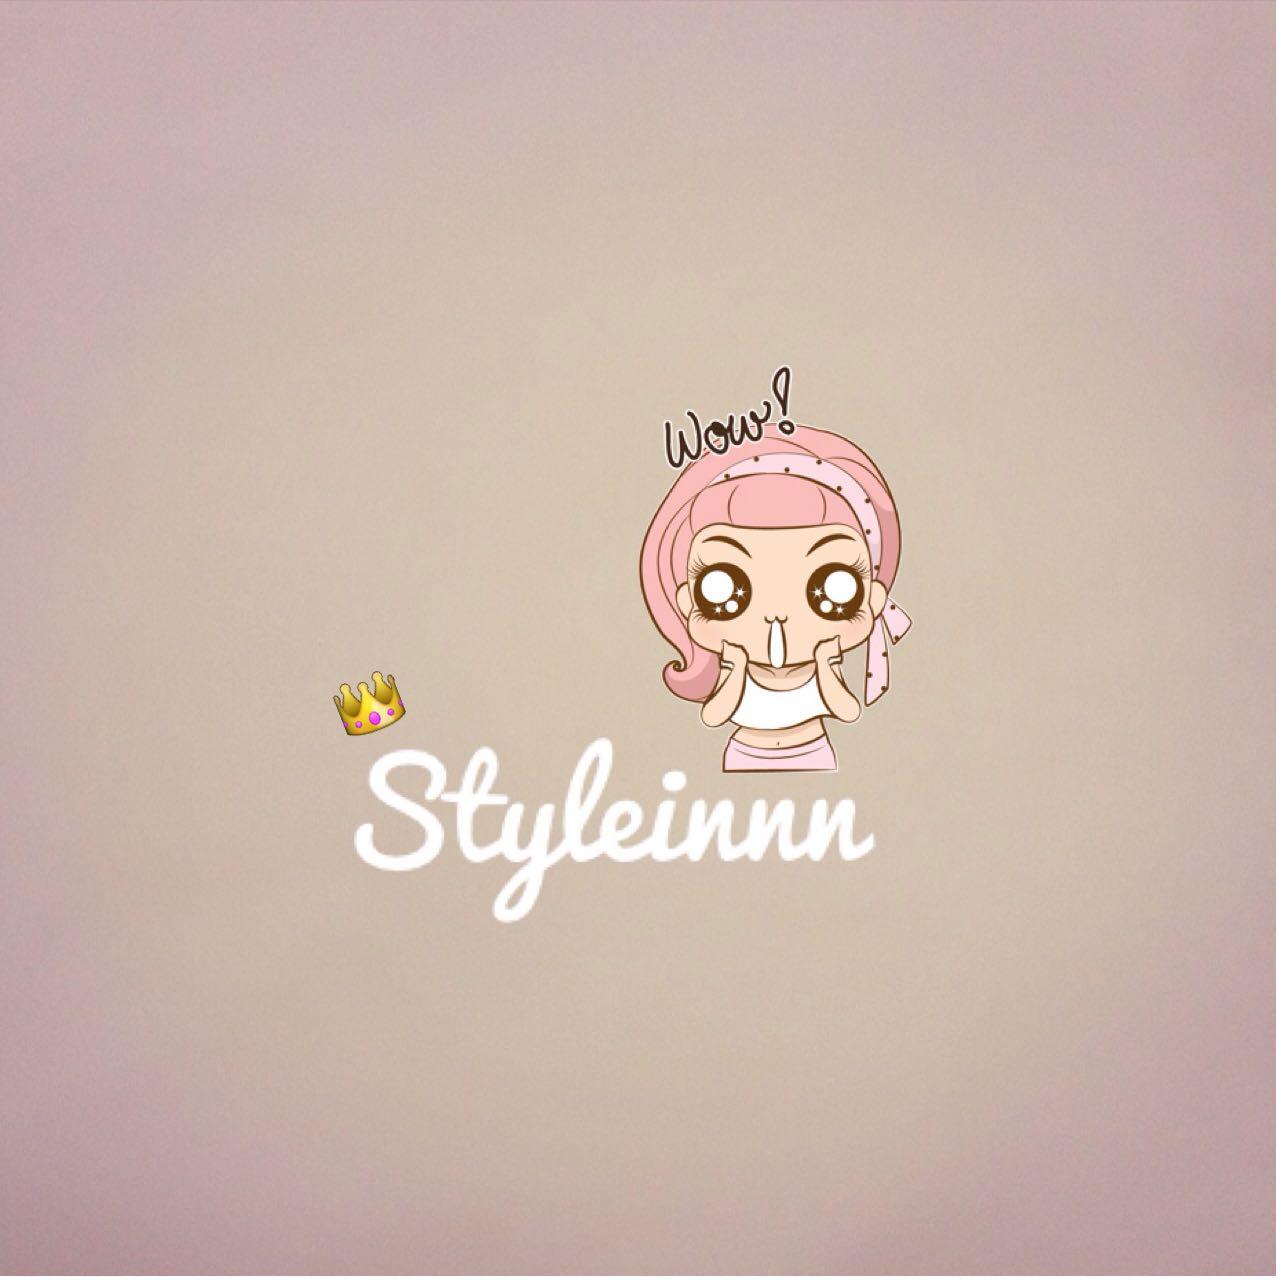 styleinnn